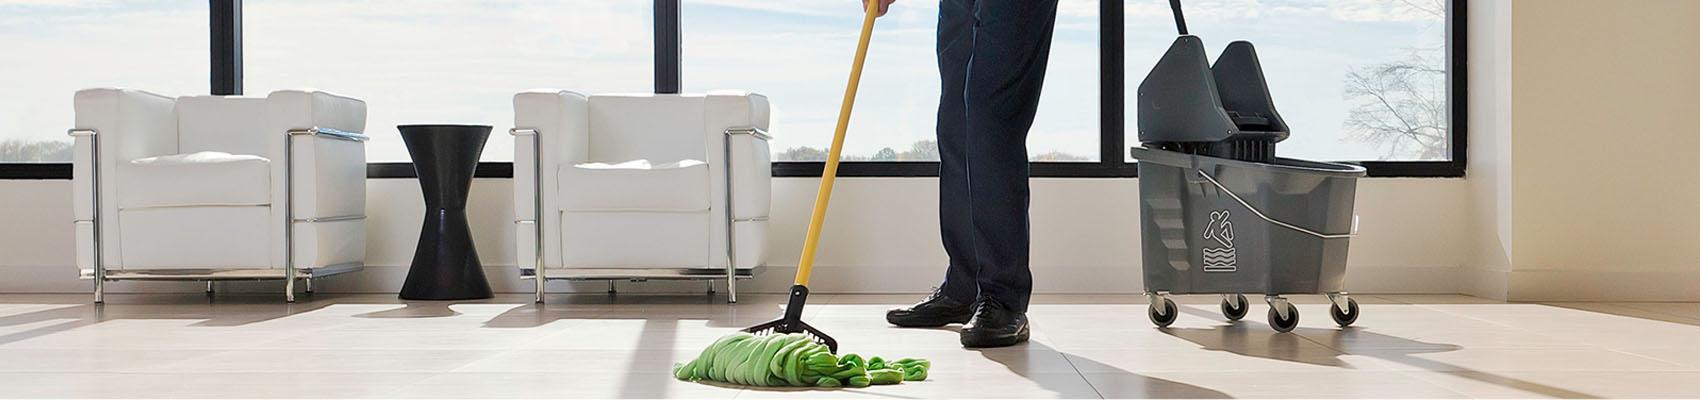 Floor Maintenance Services Delhi NCR